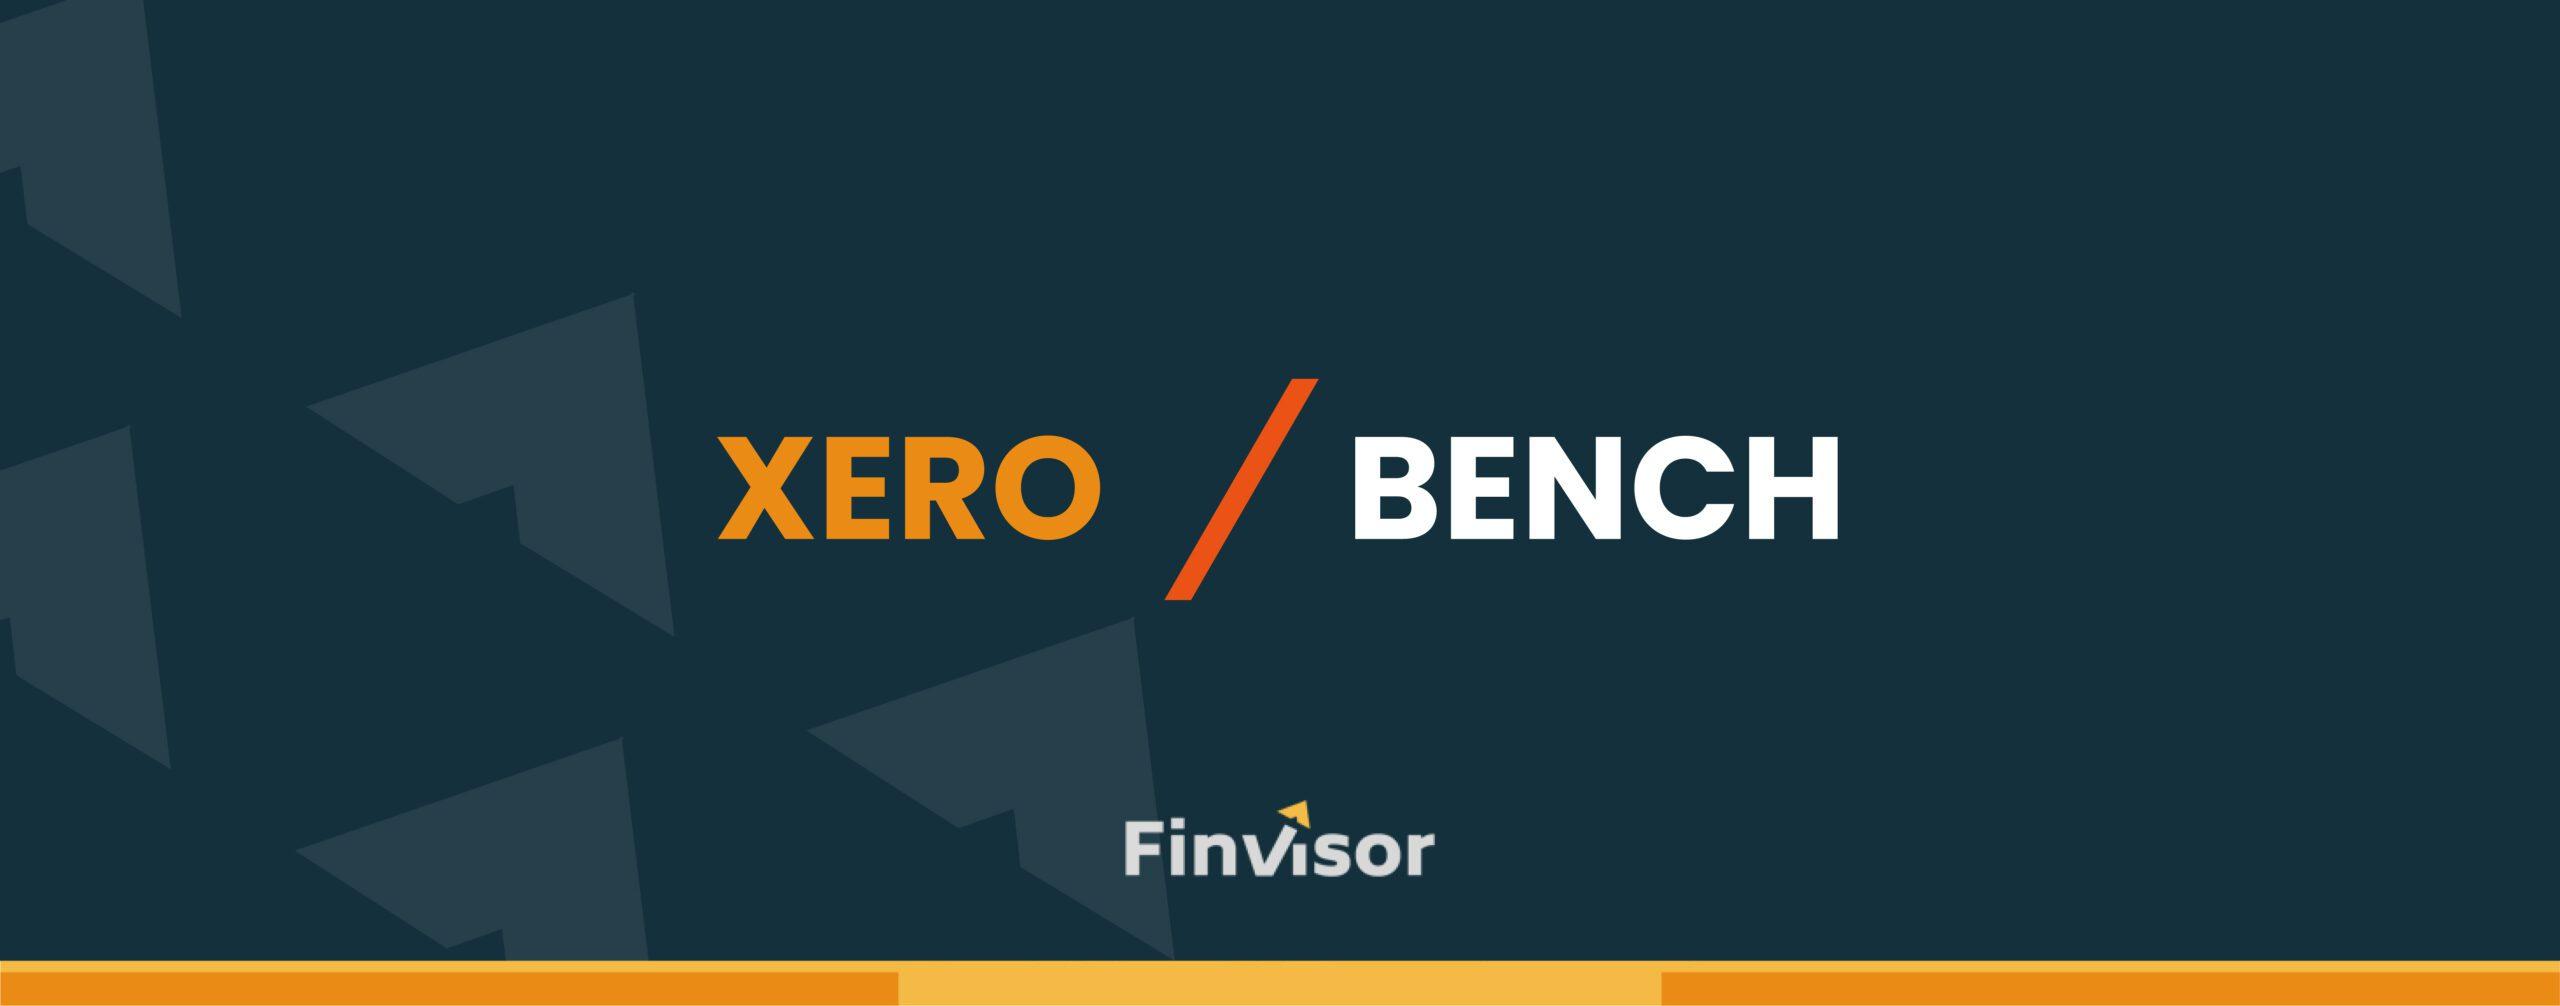 Xero vs Bench